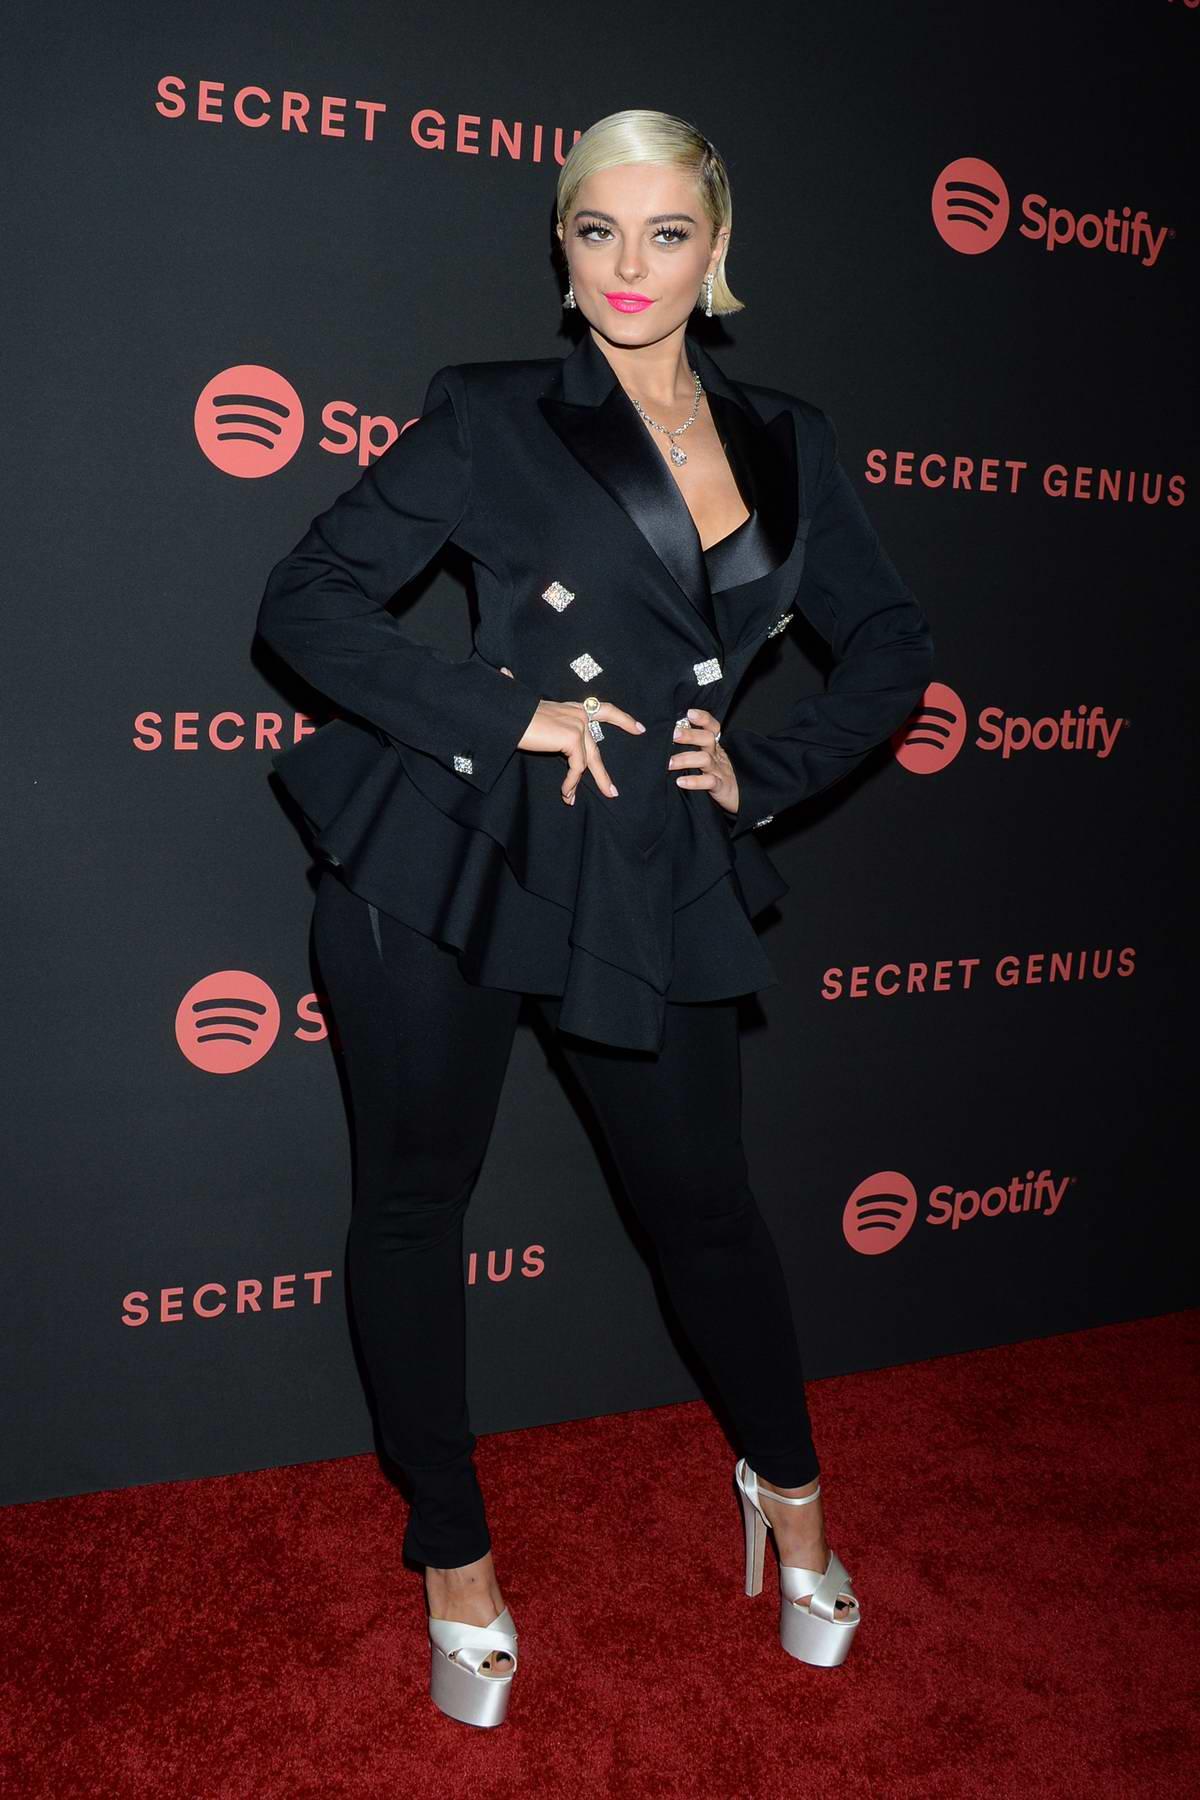 Bebe Rexha attends Spotify Secret Genius Awards 2018 in Los Angeles